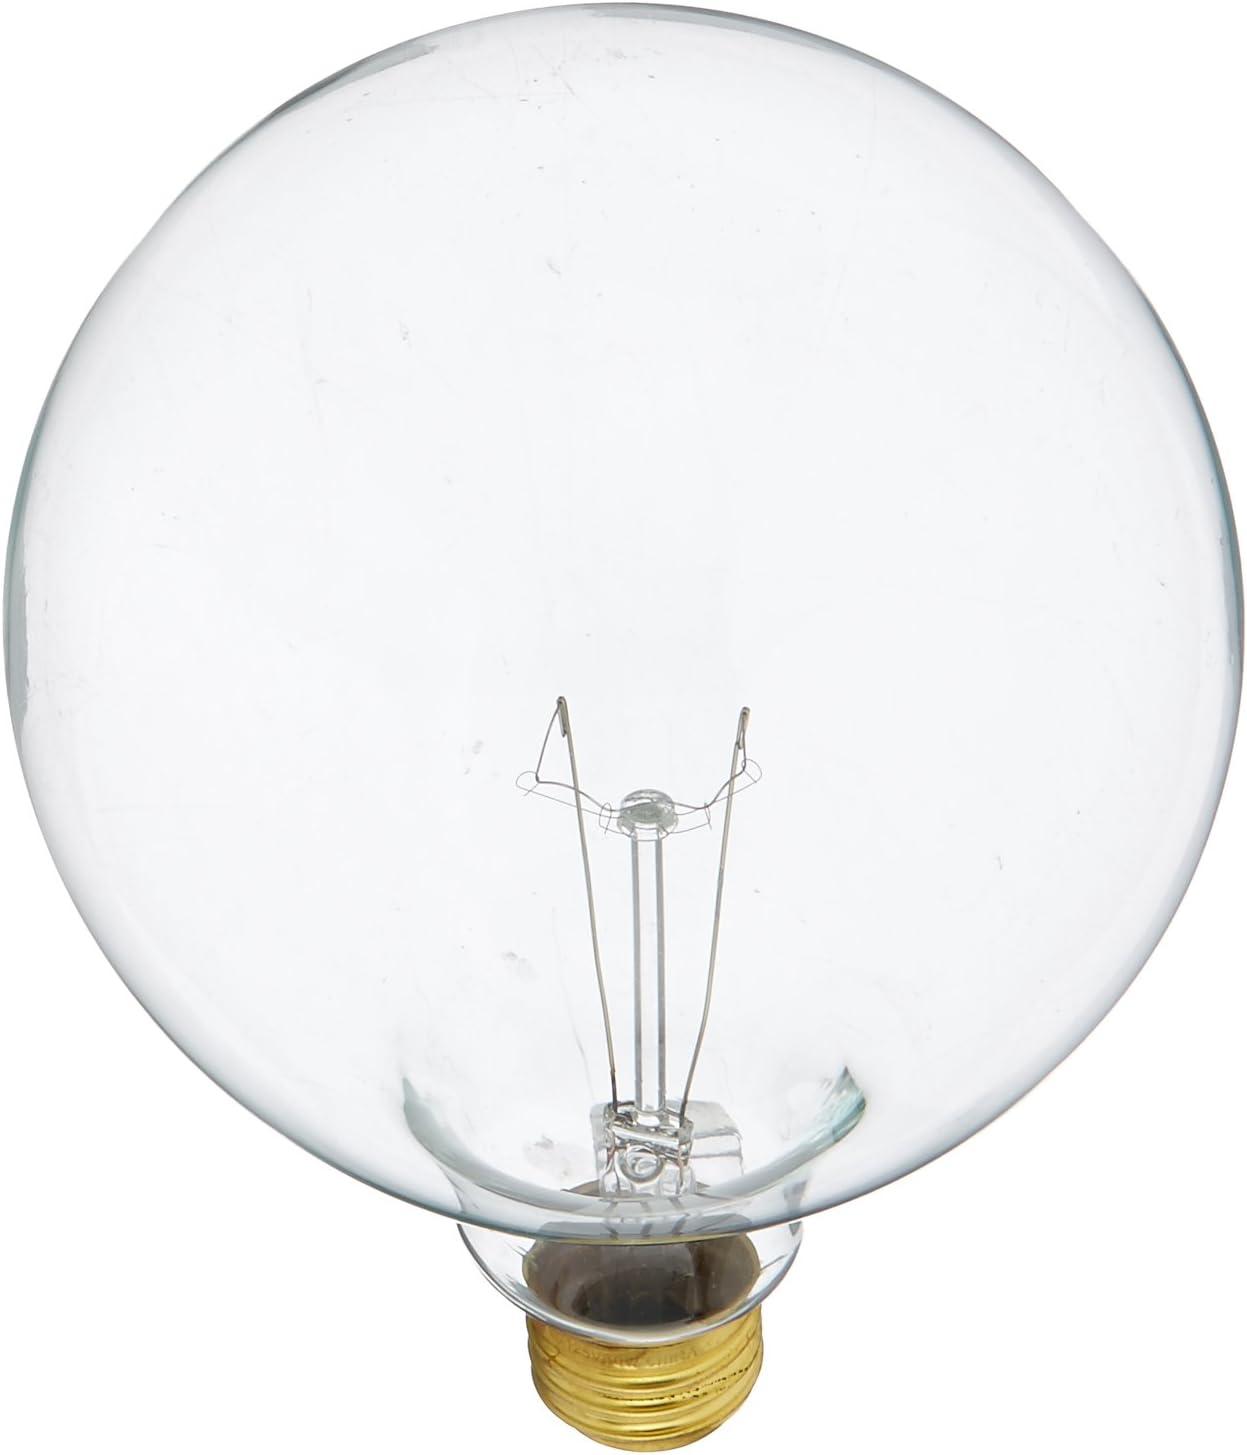 Bulbrite Incandescent G40 Medium Screw E26 Light Max 59% OFF 60 Base Bulb Trust